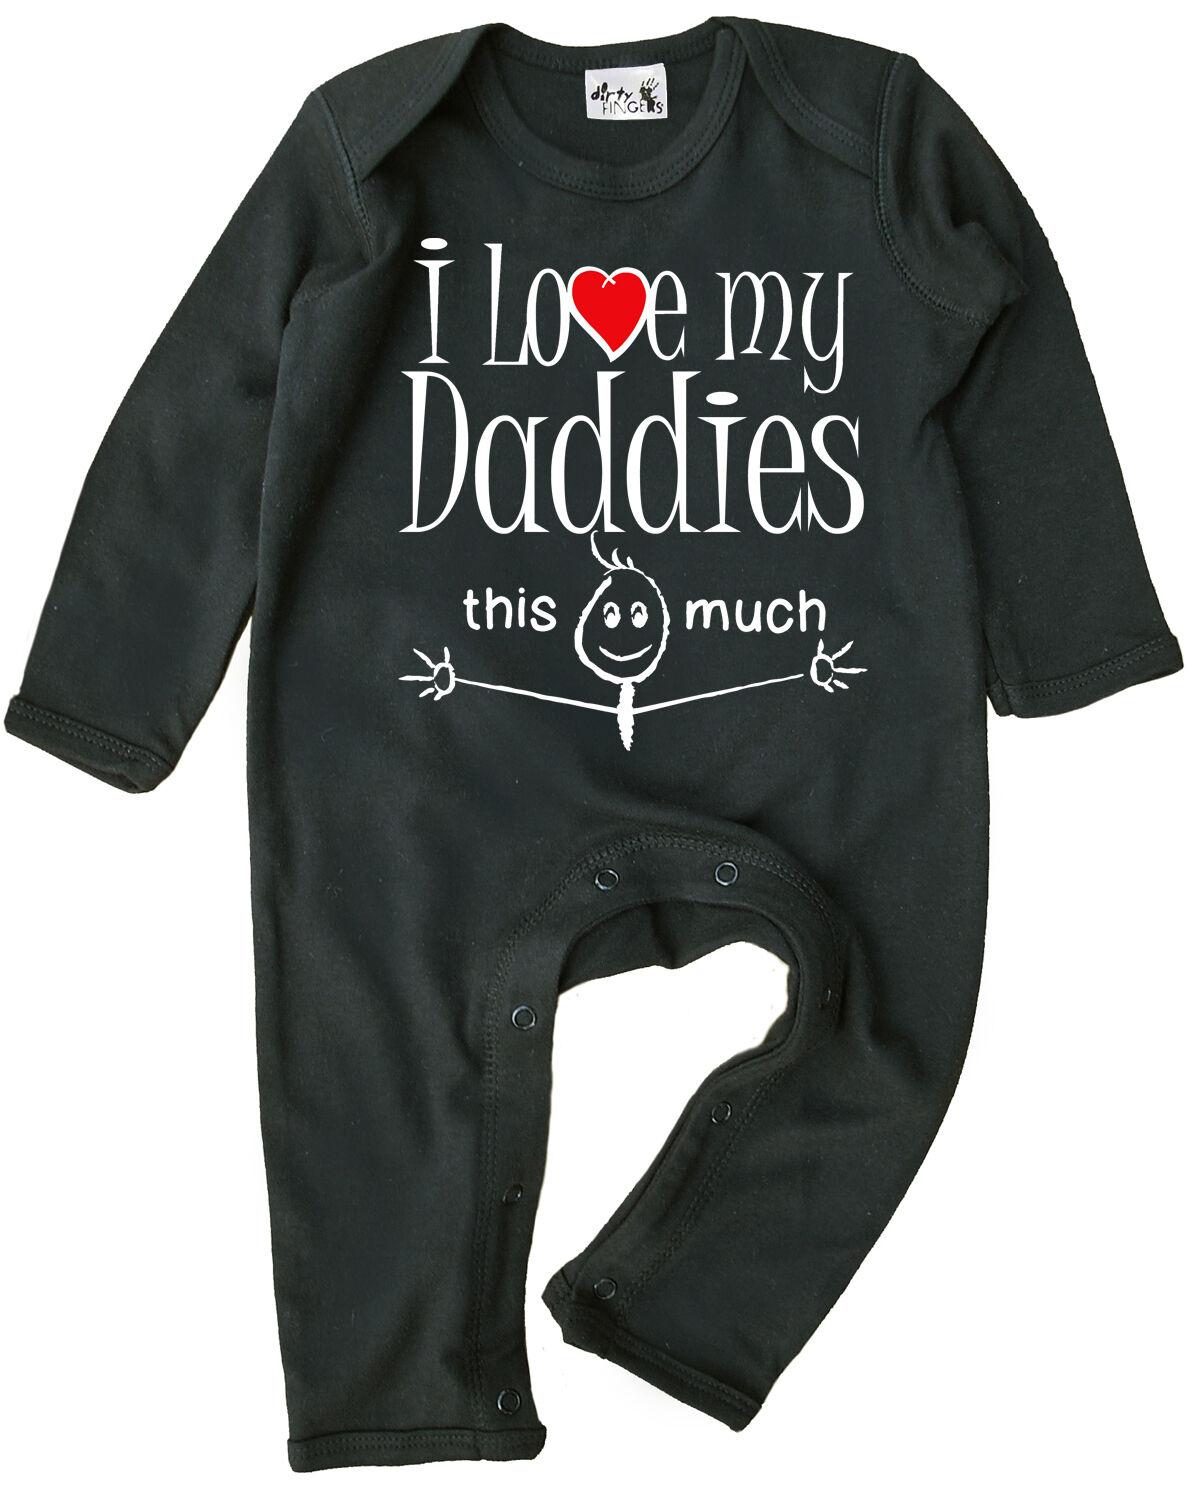 I Love My Uncle Dieses Viel Personalisiert Lustig Baby Strampler Body für